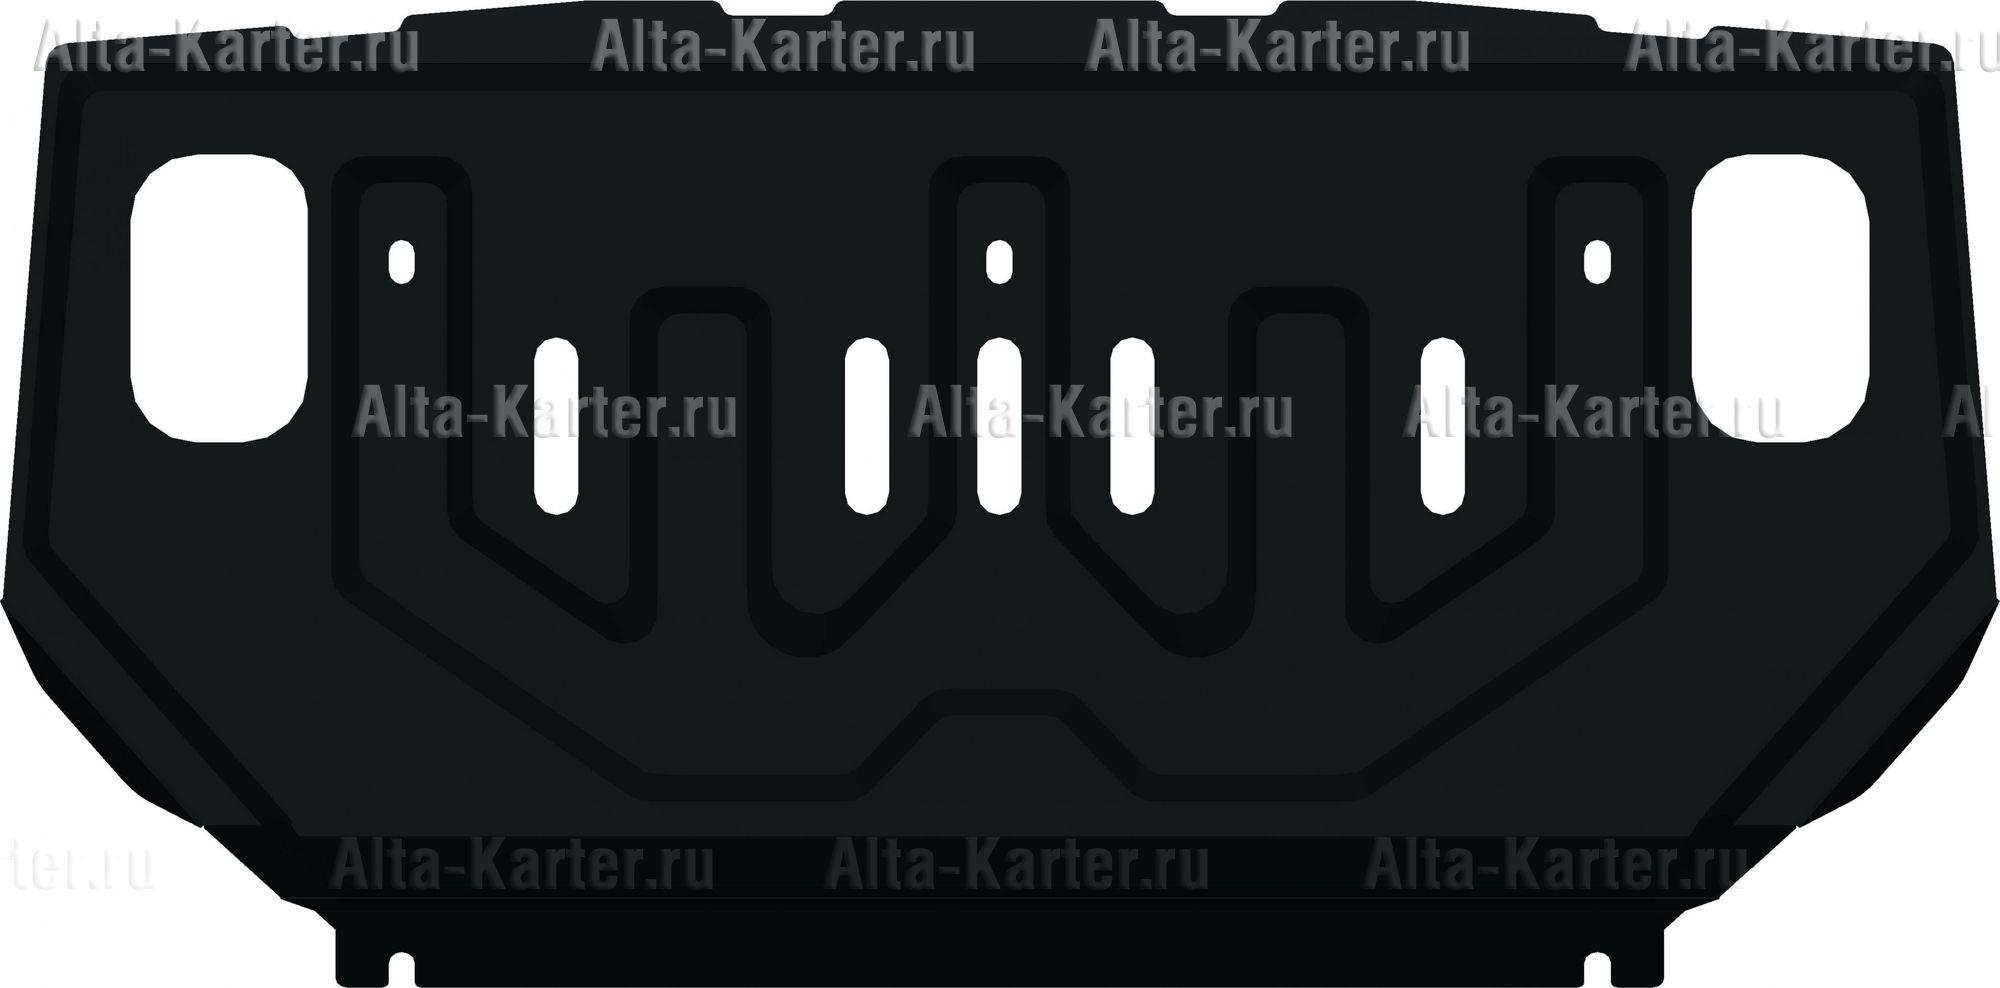 Защита Alfeco для радиатора Mitsubishi Pajero IV 2006-2021. Артикул ALF.14.05 st